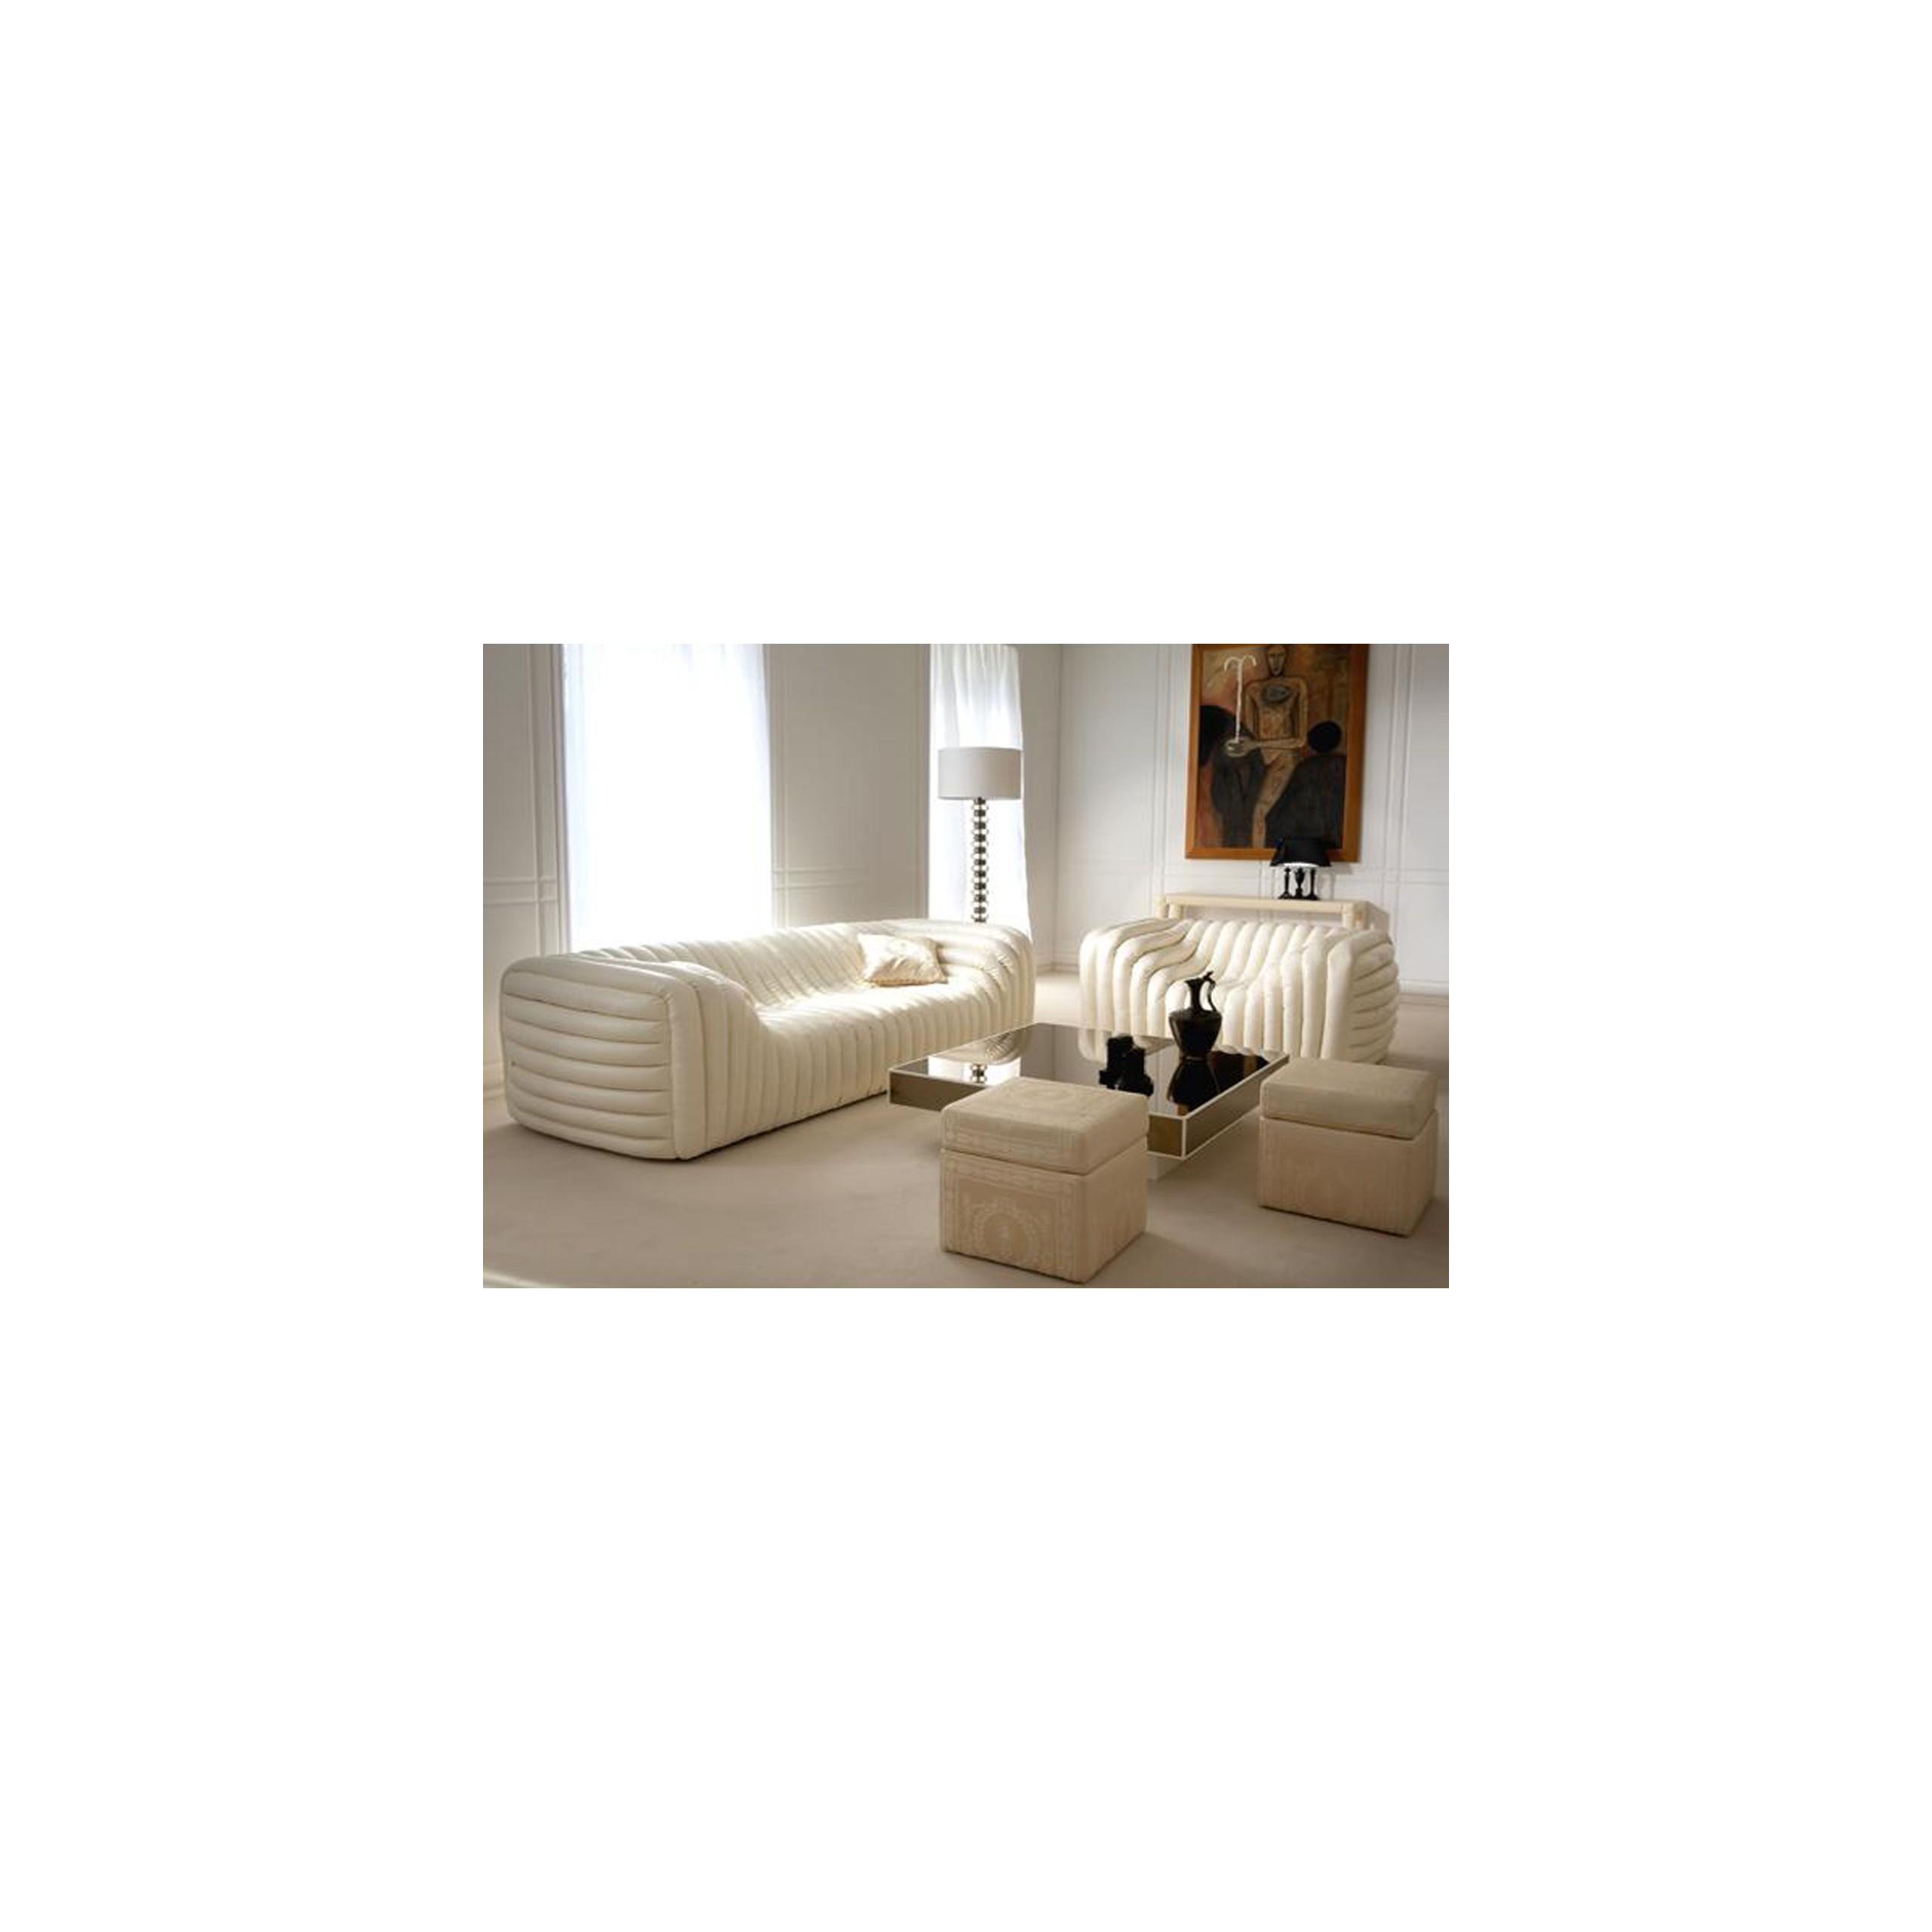 Exceptionnel Versace Home Sofa | Versace 2 Seater Sofa Settee Genuine Italian .